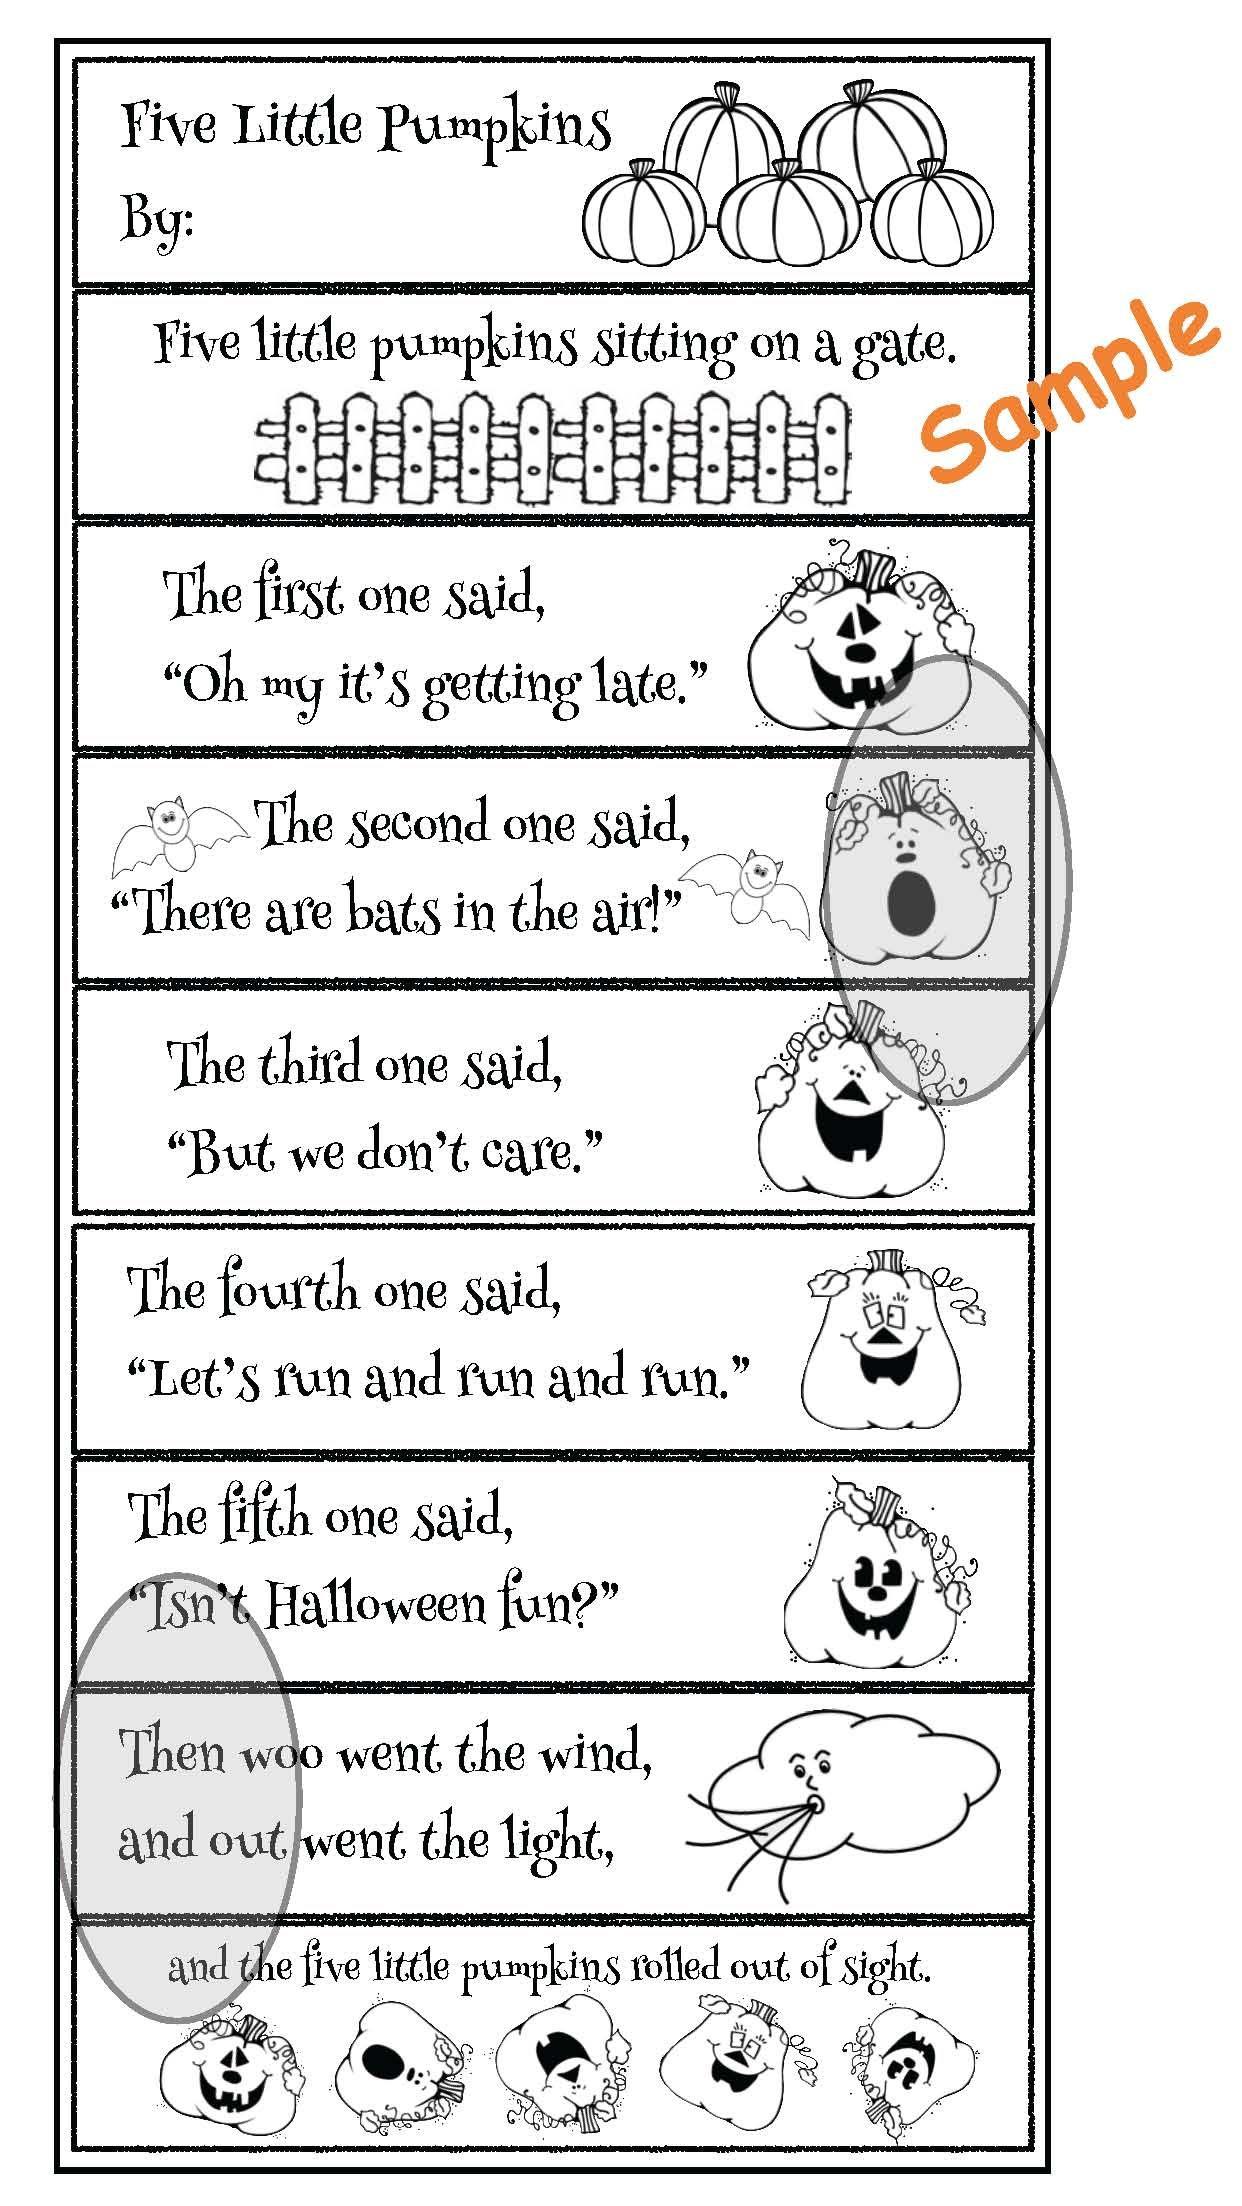 Activities For The 5 Little Pumpkins Poem